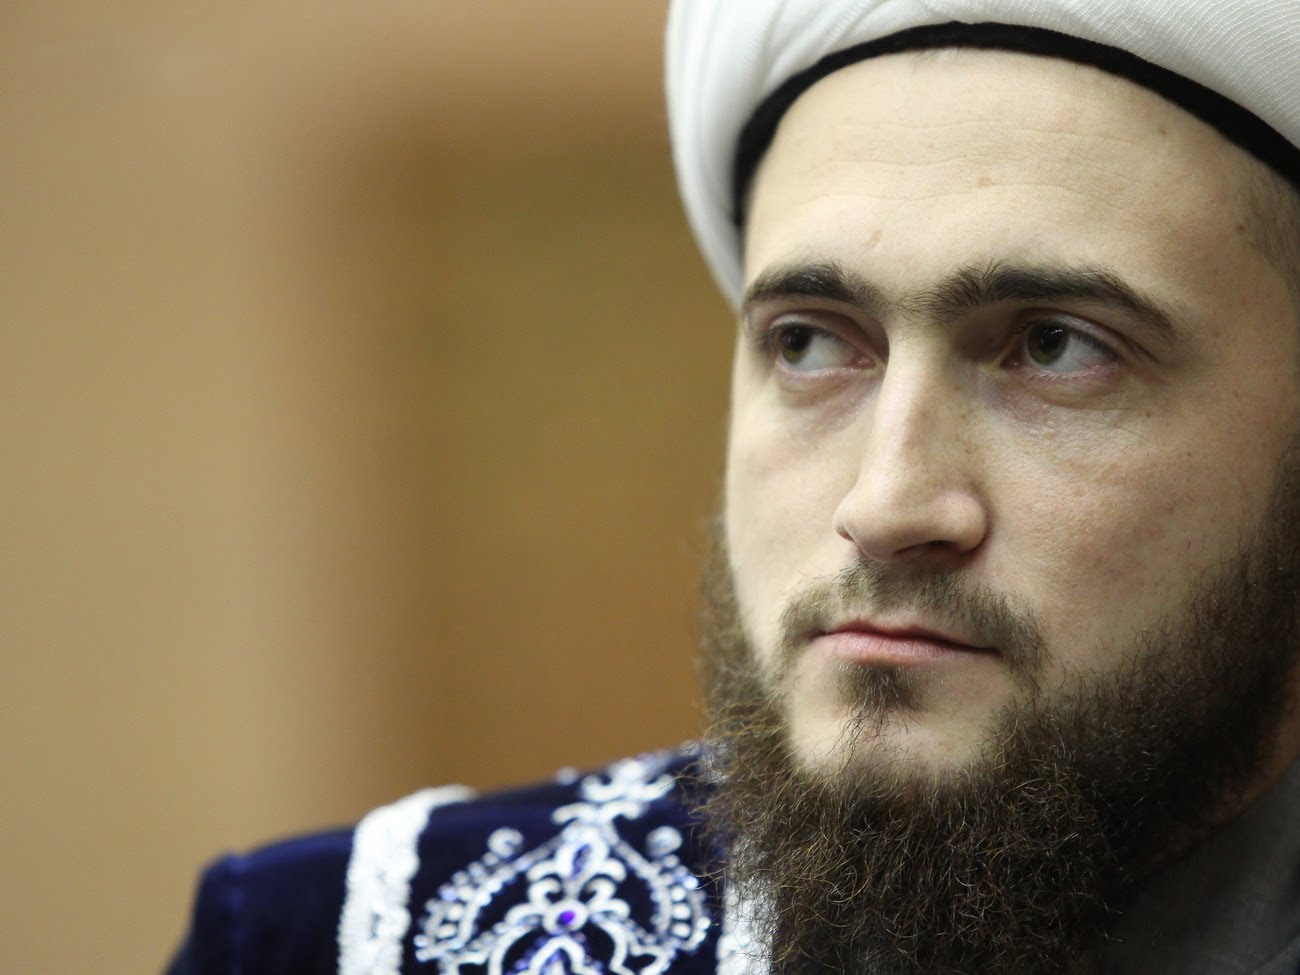 Муфтия Татарстана обвинили в отходе от линии борьбы с «ваххабизмом»